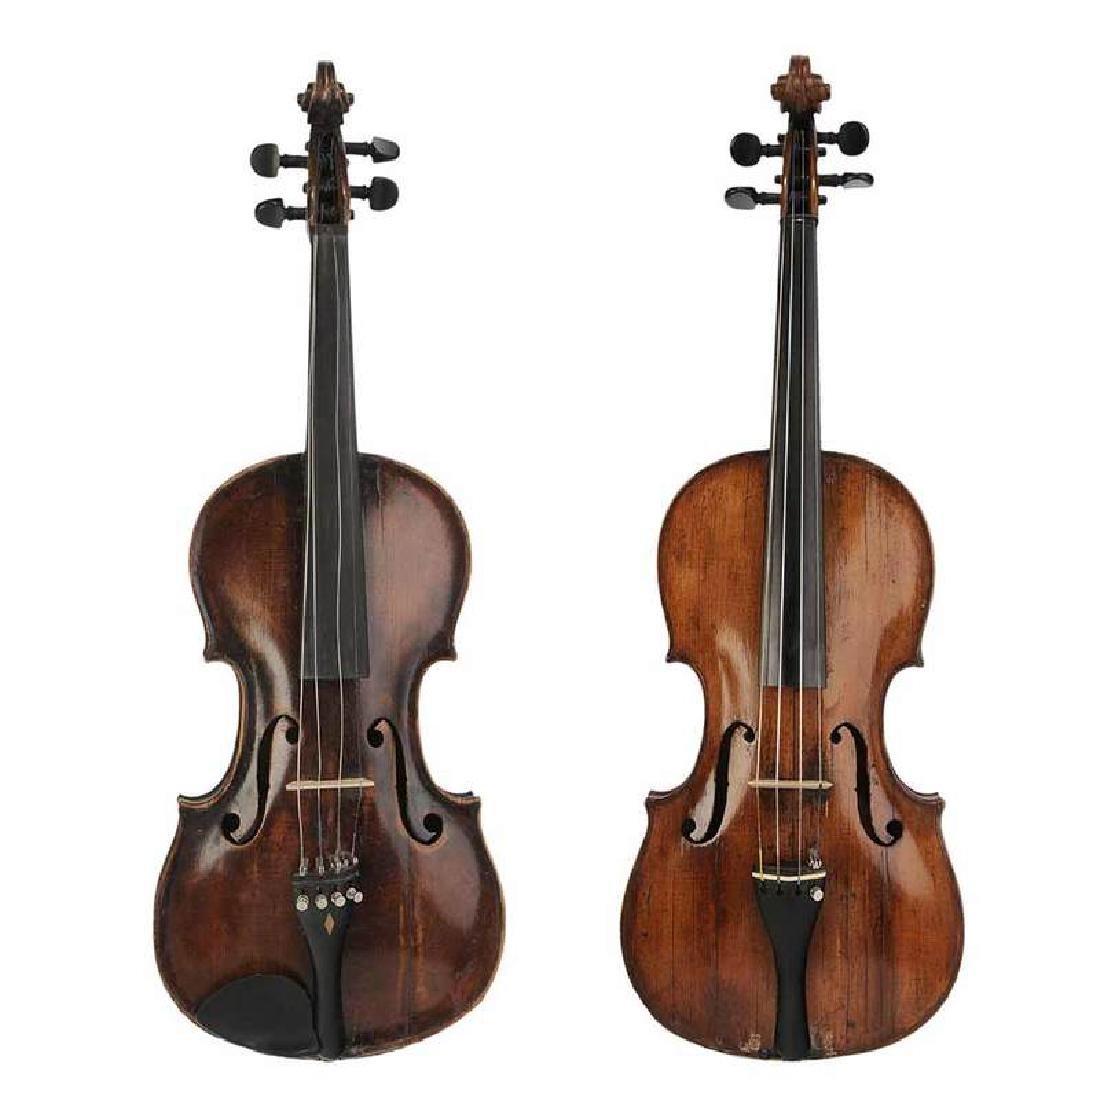 Two Vintage Violins in Cases